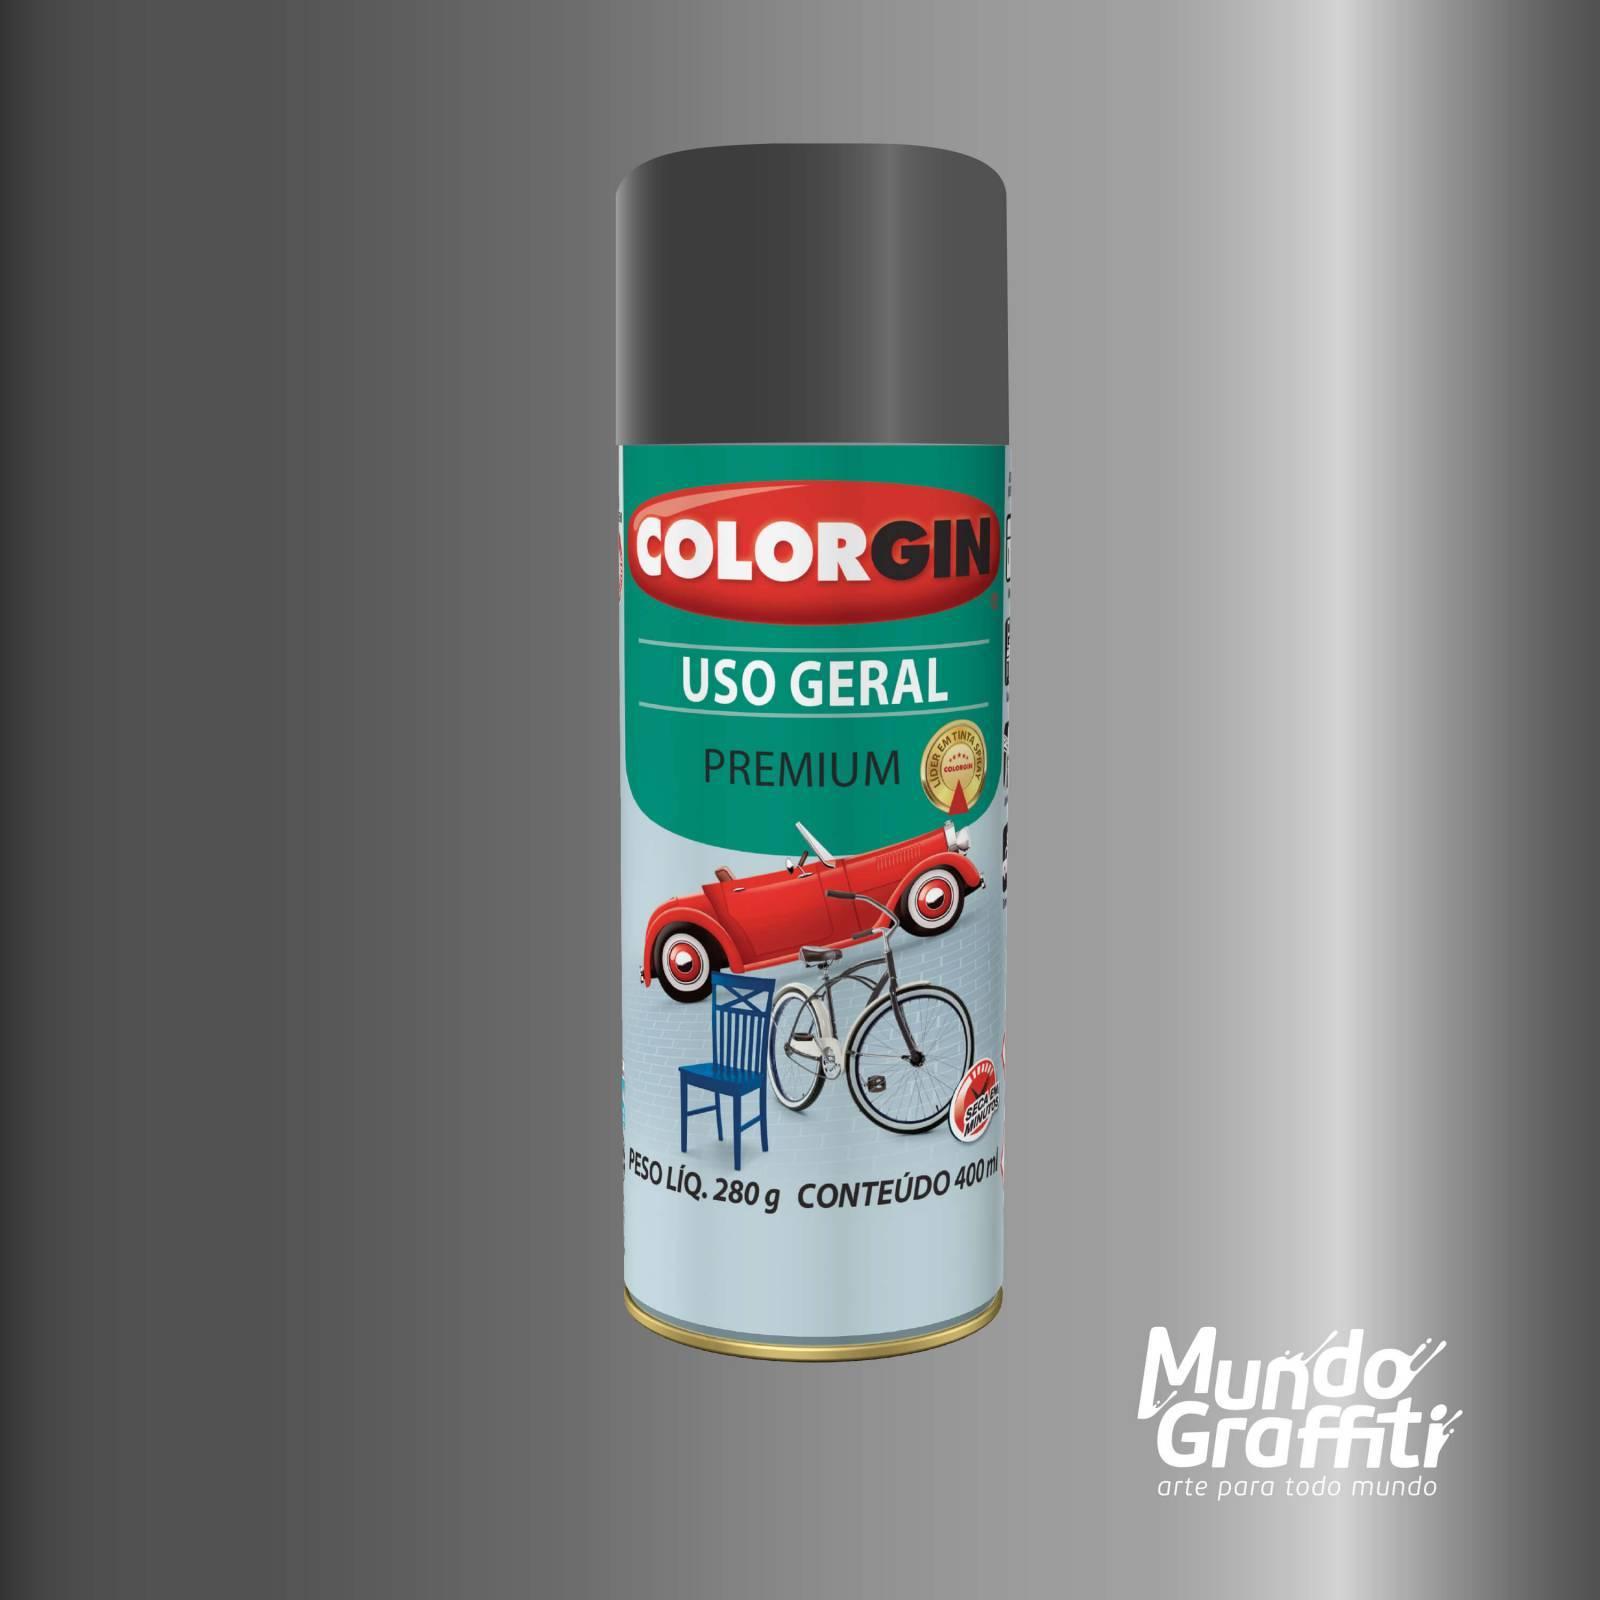 Tinta Spray Colorgin Uso Geral 57101 Grafite Executivo Metal - Mundo Graffiti